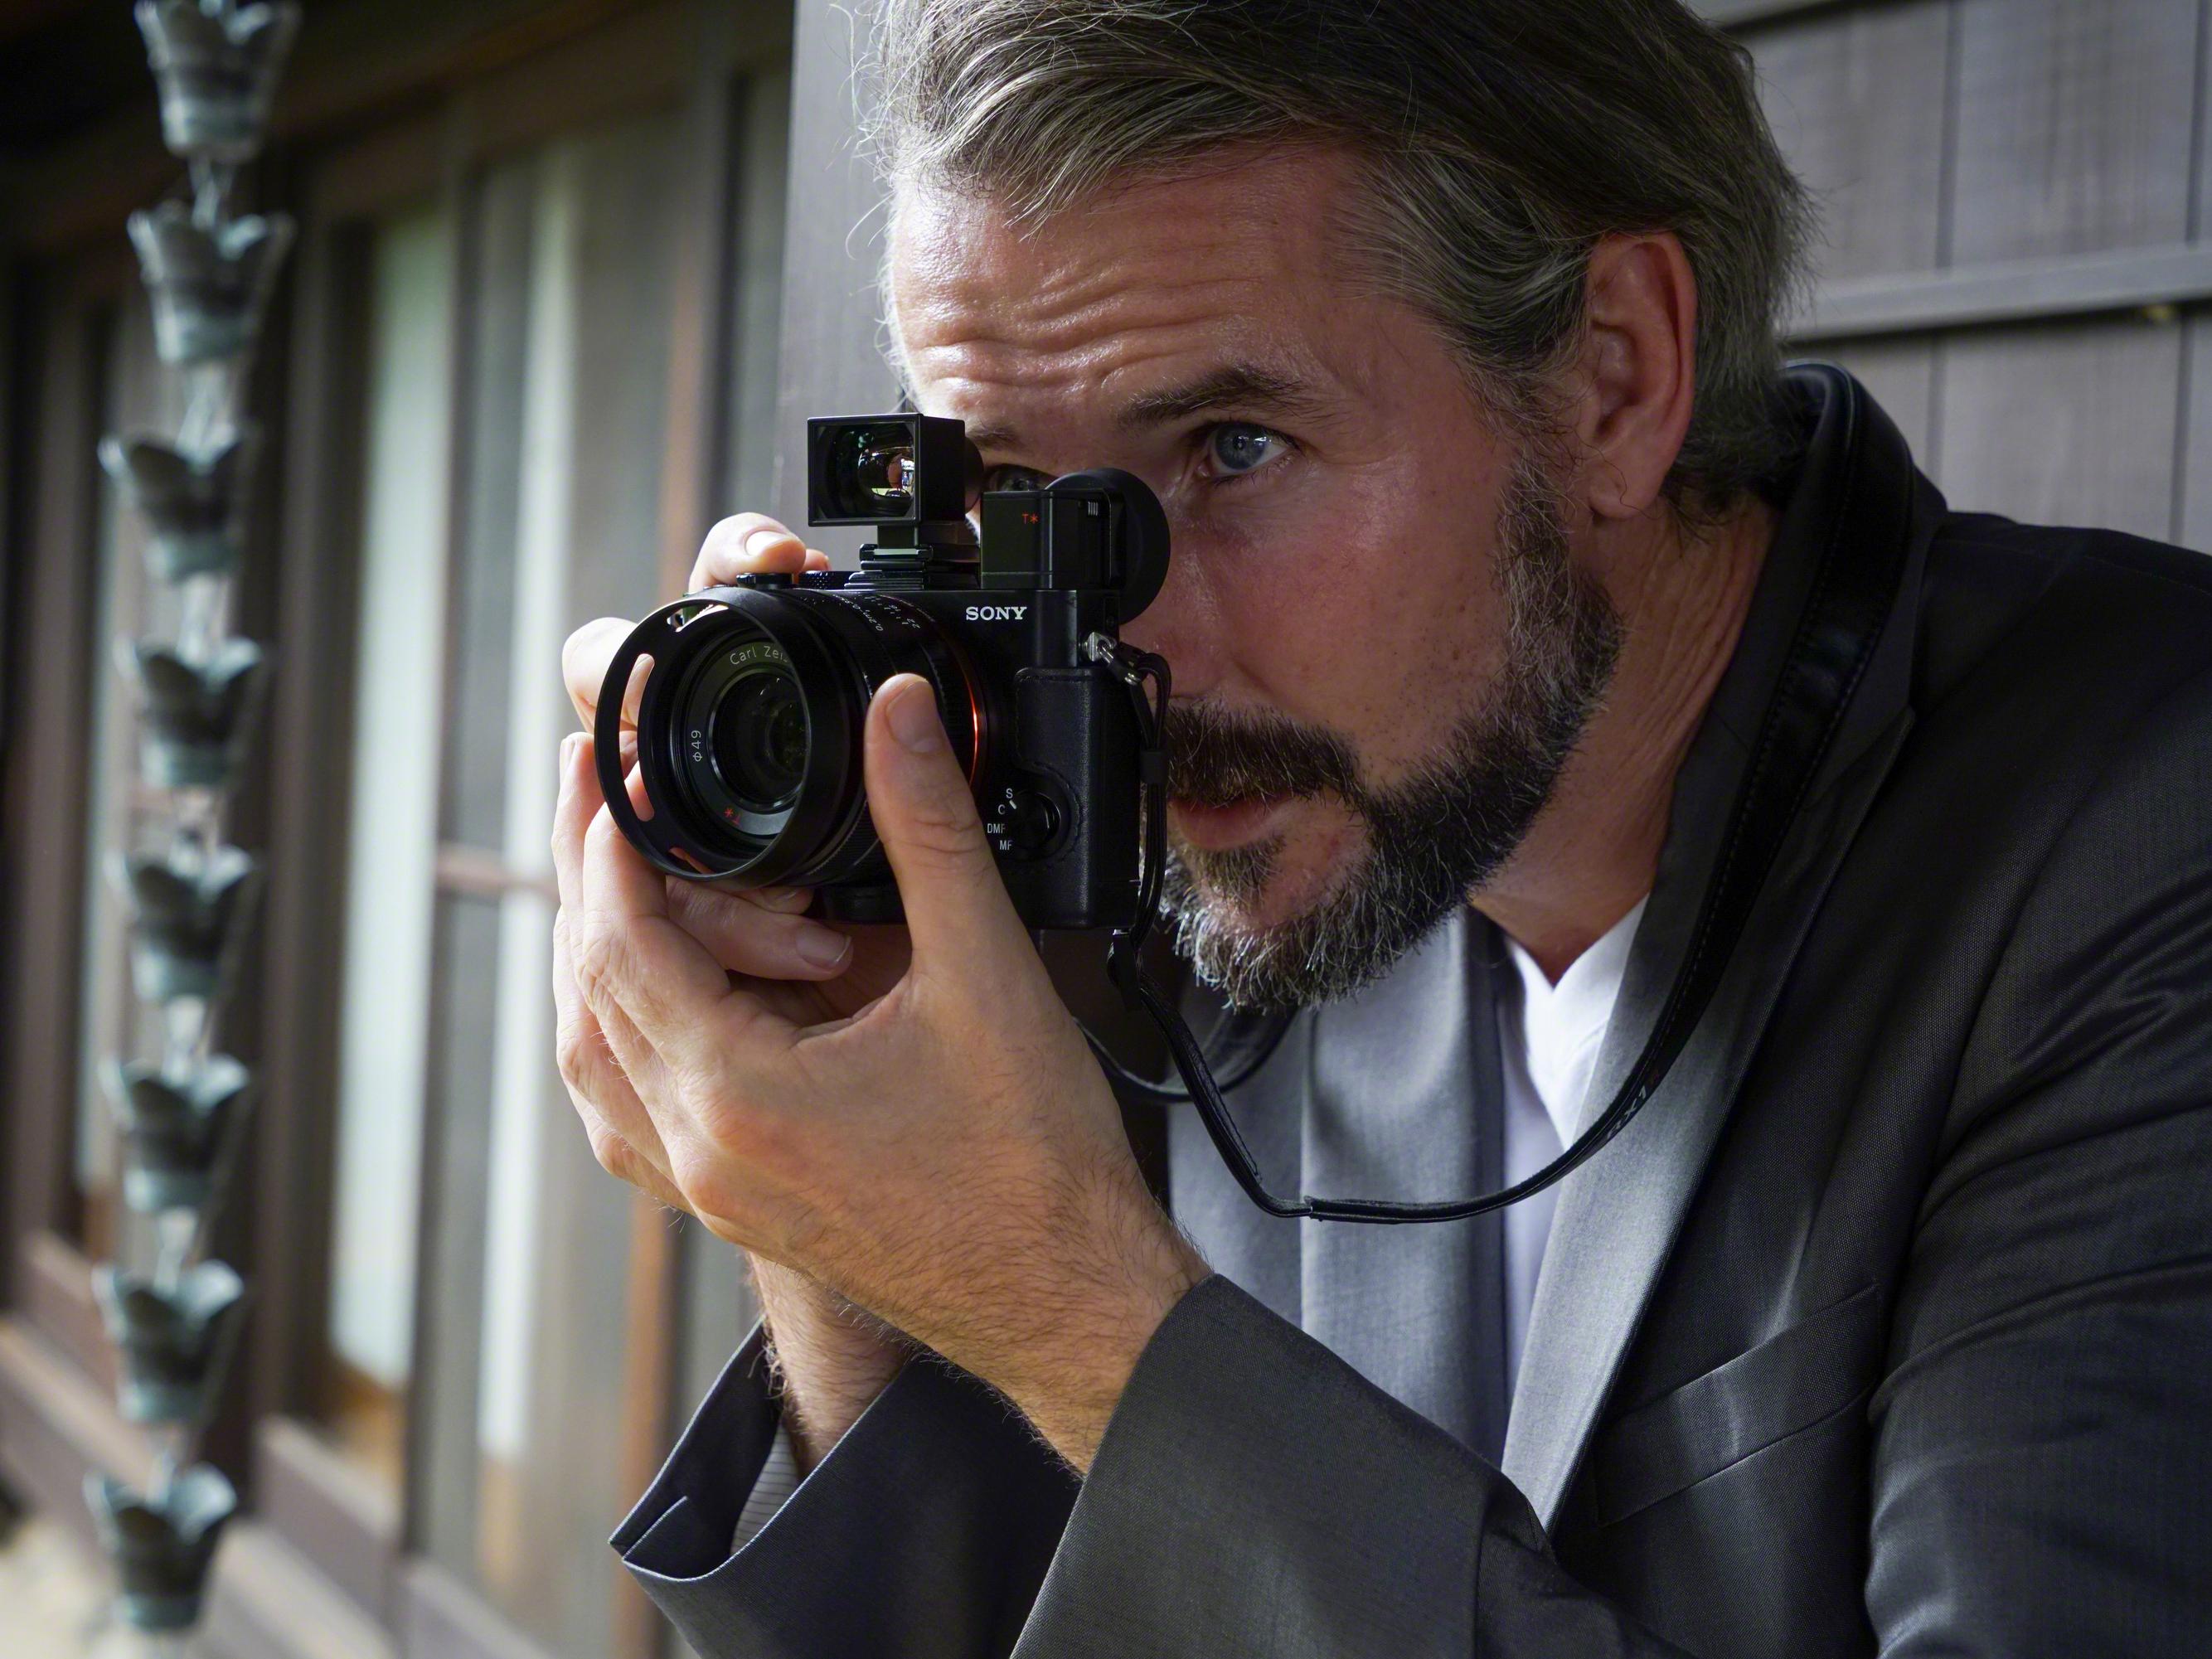 Снова лучший компактный фуллфрейм. Обзор камеры Sony RX1R ...: http://www.ferra.ru/ru/digiphoto/review/obzor-sony-rx1r-ii/